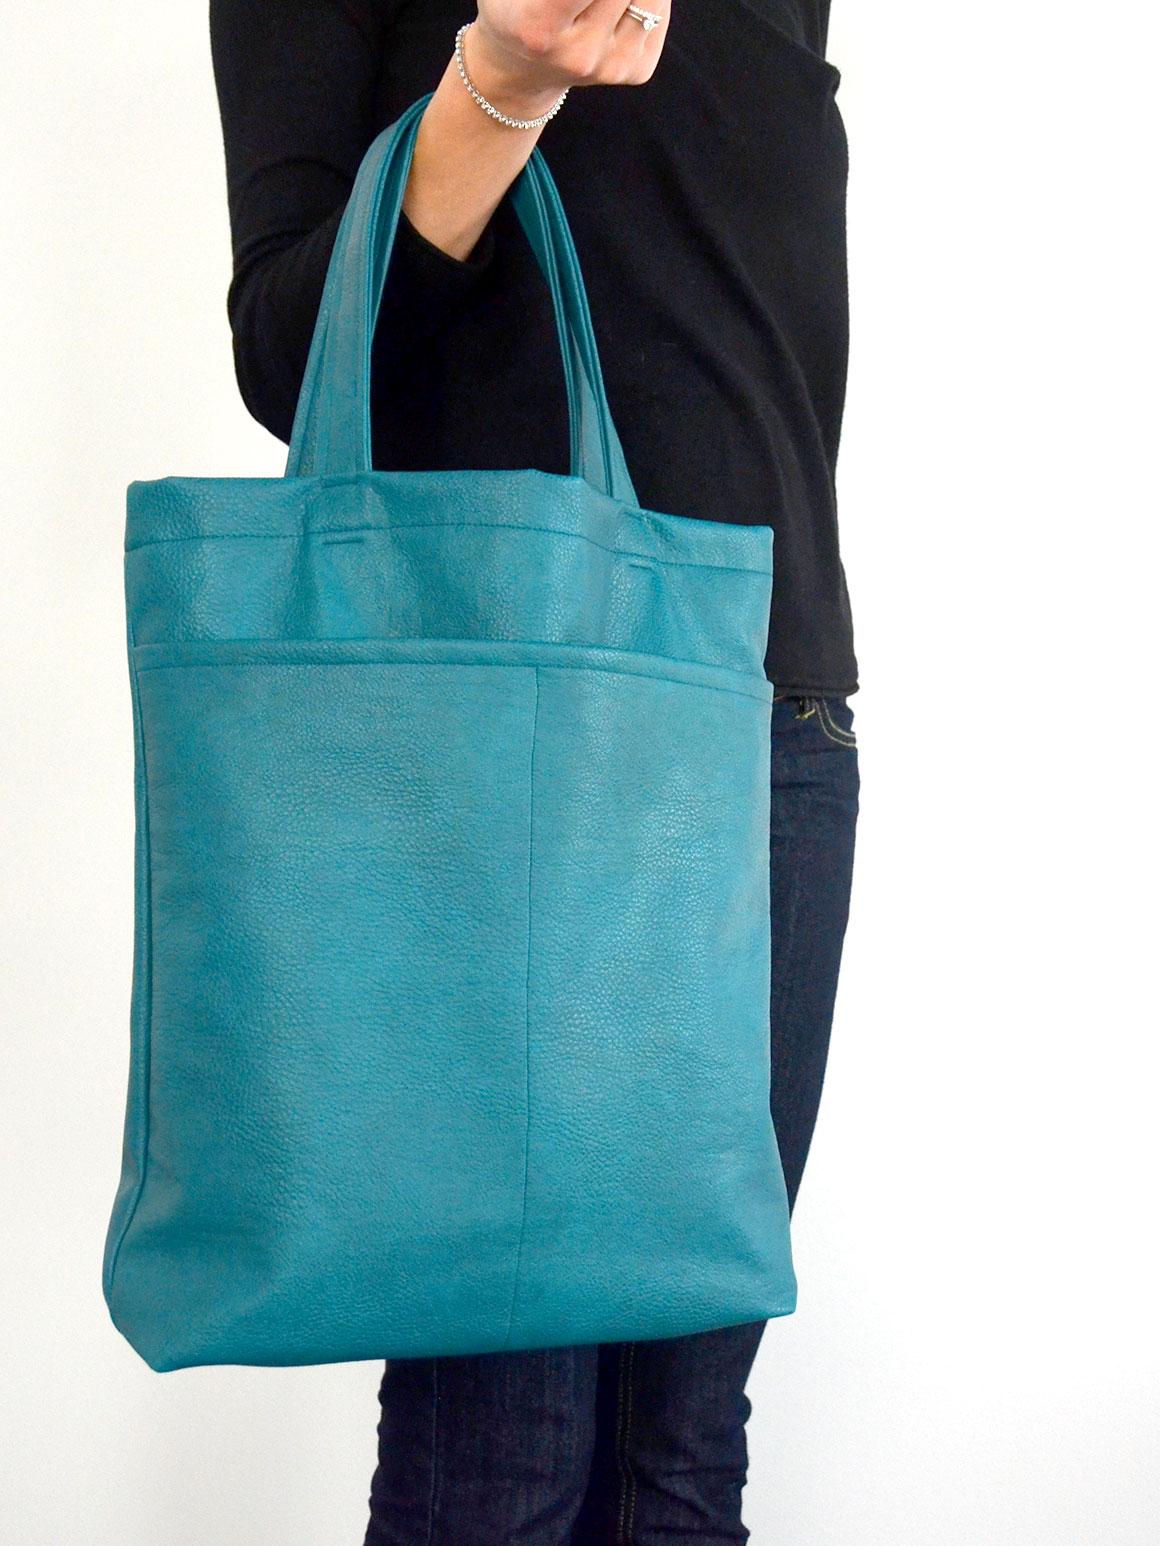 DIY: Shopper van nepleer